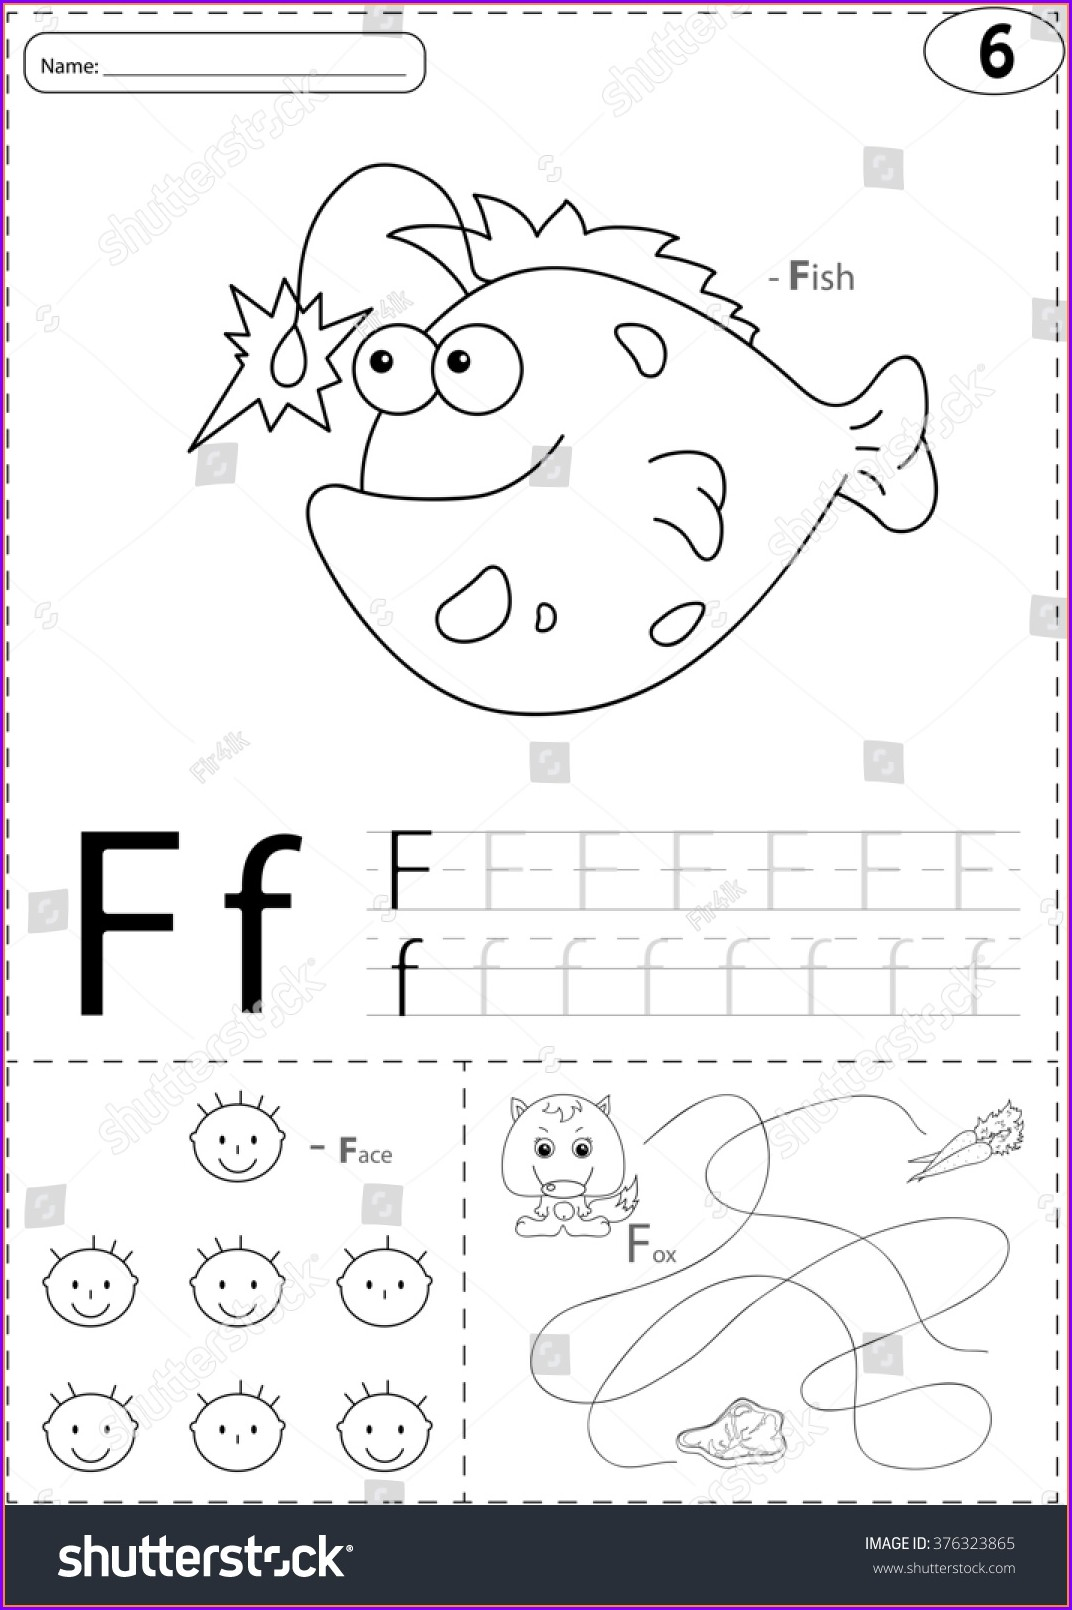 Free Cursive Writing Worksheets A Z